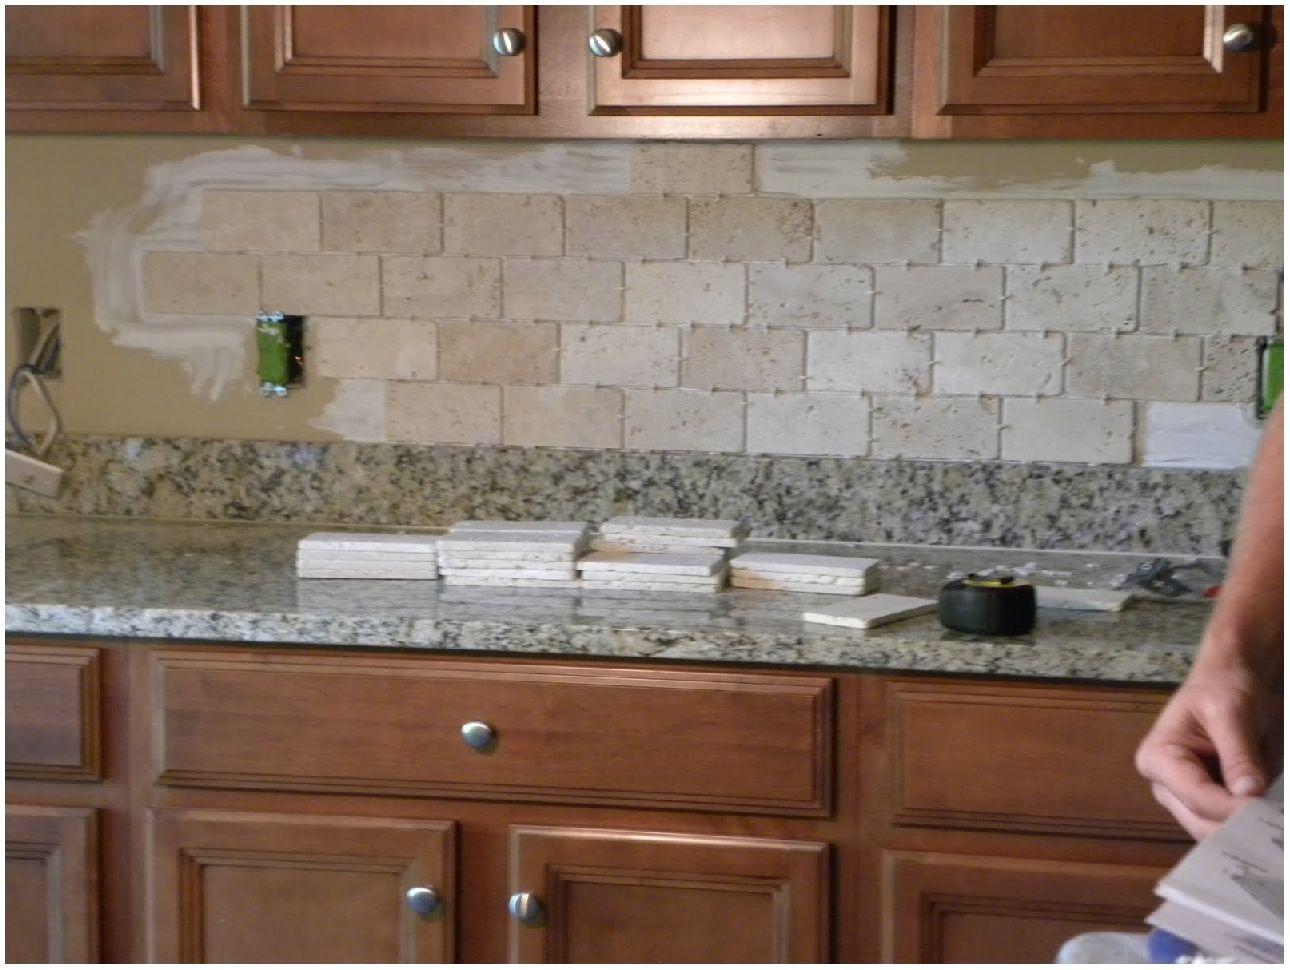 Beautifull Easy Diy Kitchen With Vinyl Tablecloth Ideas Diy Diy Backsplash Cheap Kitchen Backsplash Diy Kitchen Backsplash